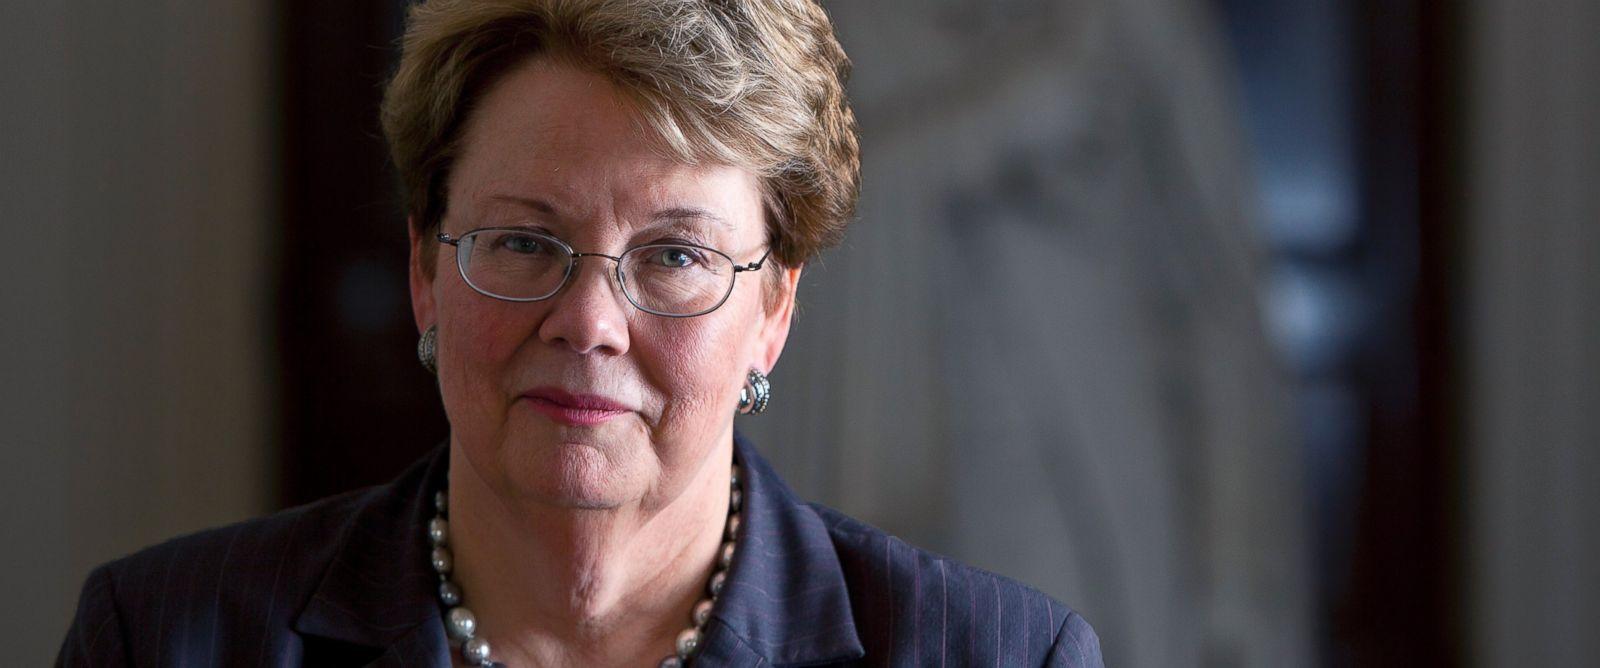 PHOTO: Teresa Sullivan, President of the University of Virginia poses for a portrait, Aug. 1, 2012.